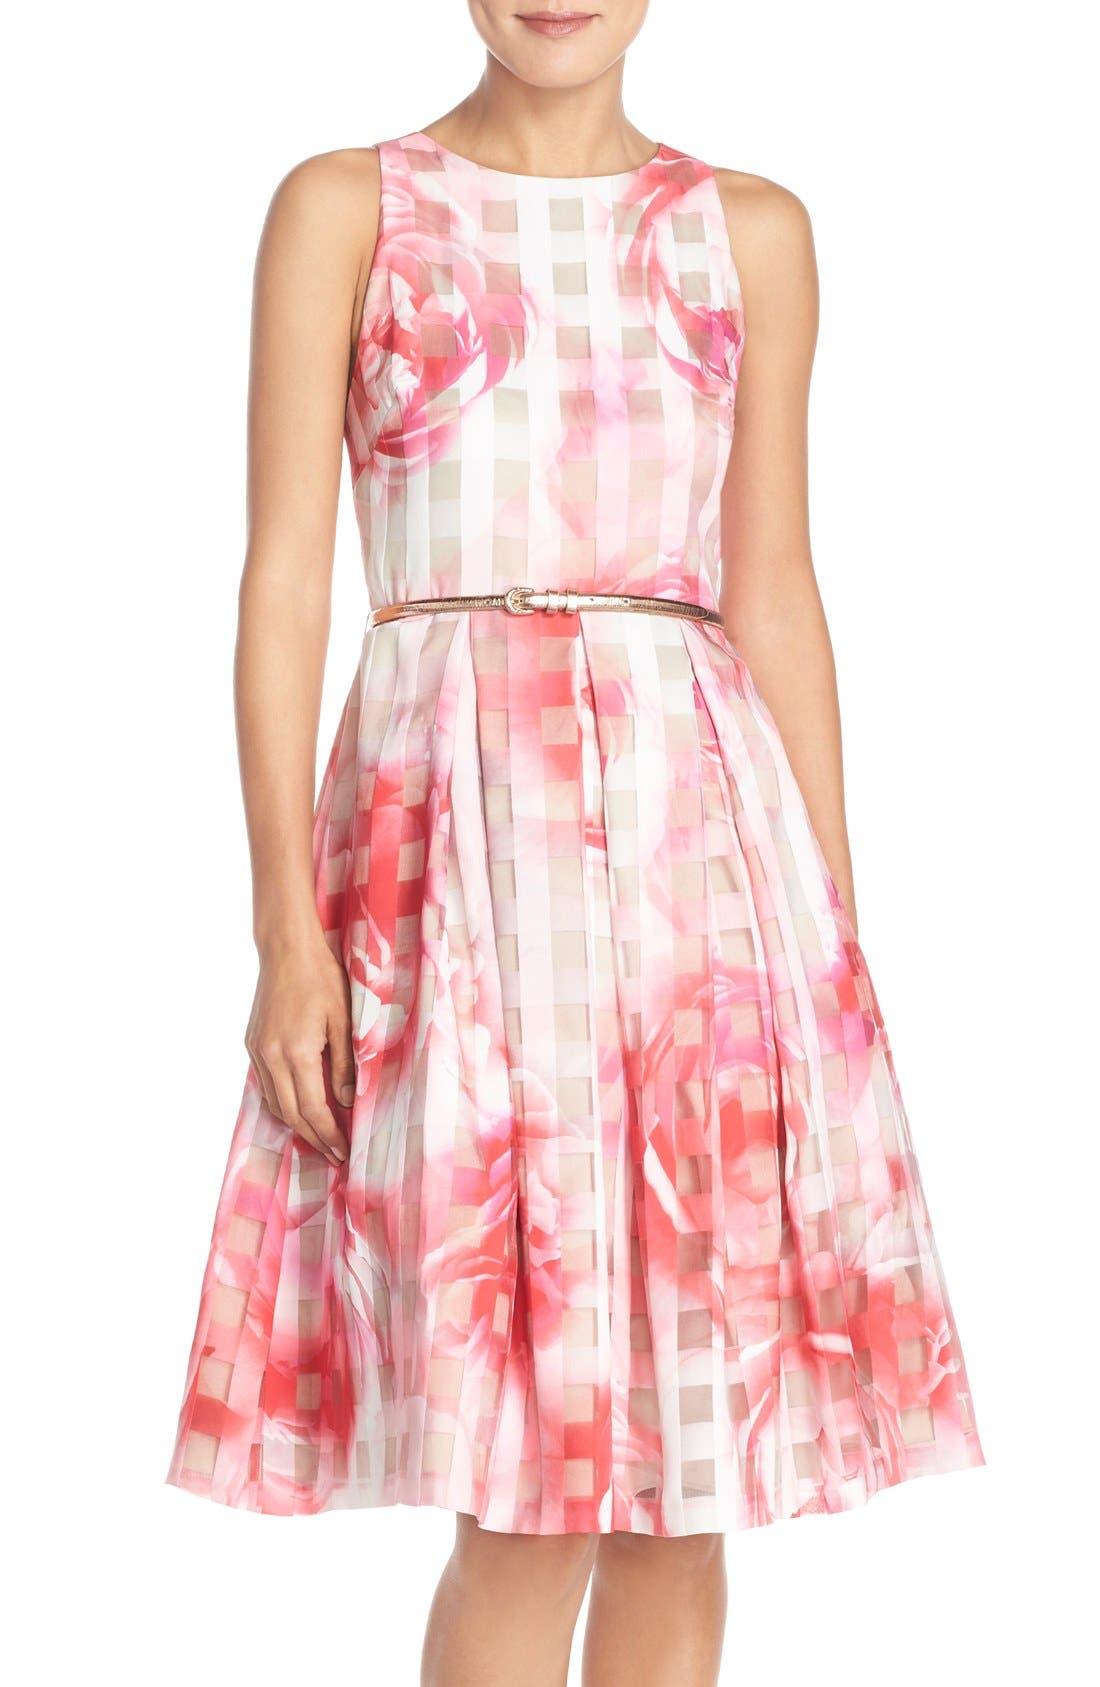 Alternate Image 1 Selected - Eliza J Floral Organza Fit & Flare Dress (Regular & Petite)